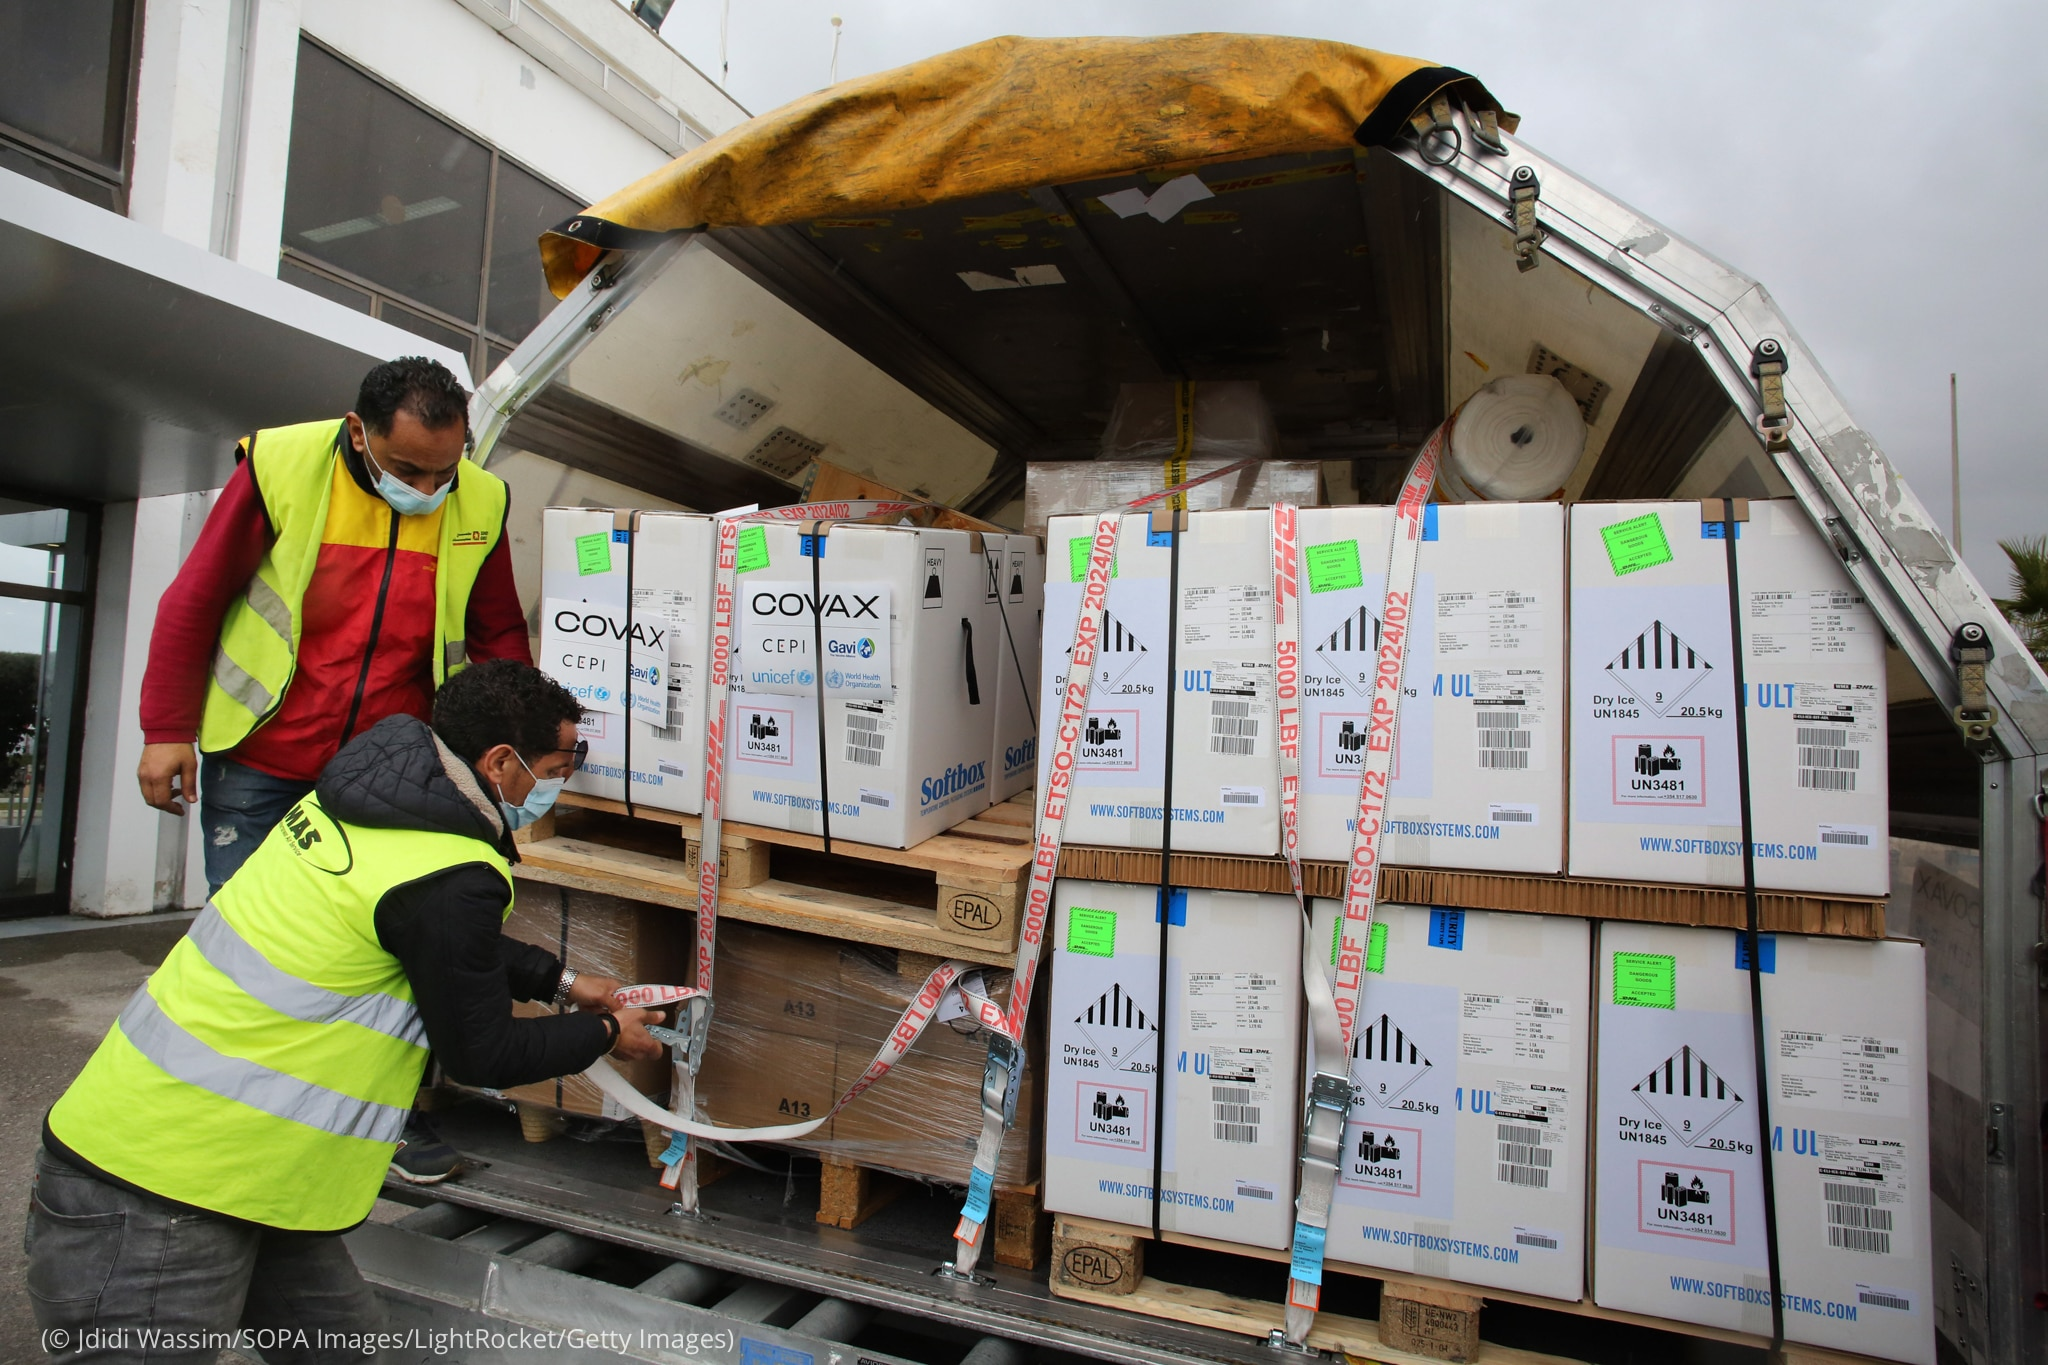 Men unloading boxes of vaccines (© Jdidi Wassim/SOPA Images/LightRocket/Getty Images)